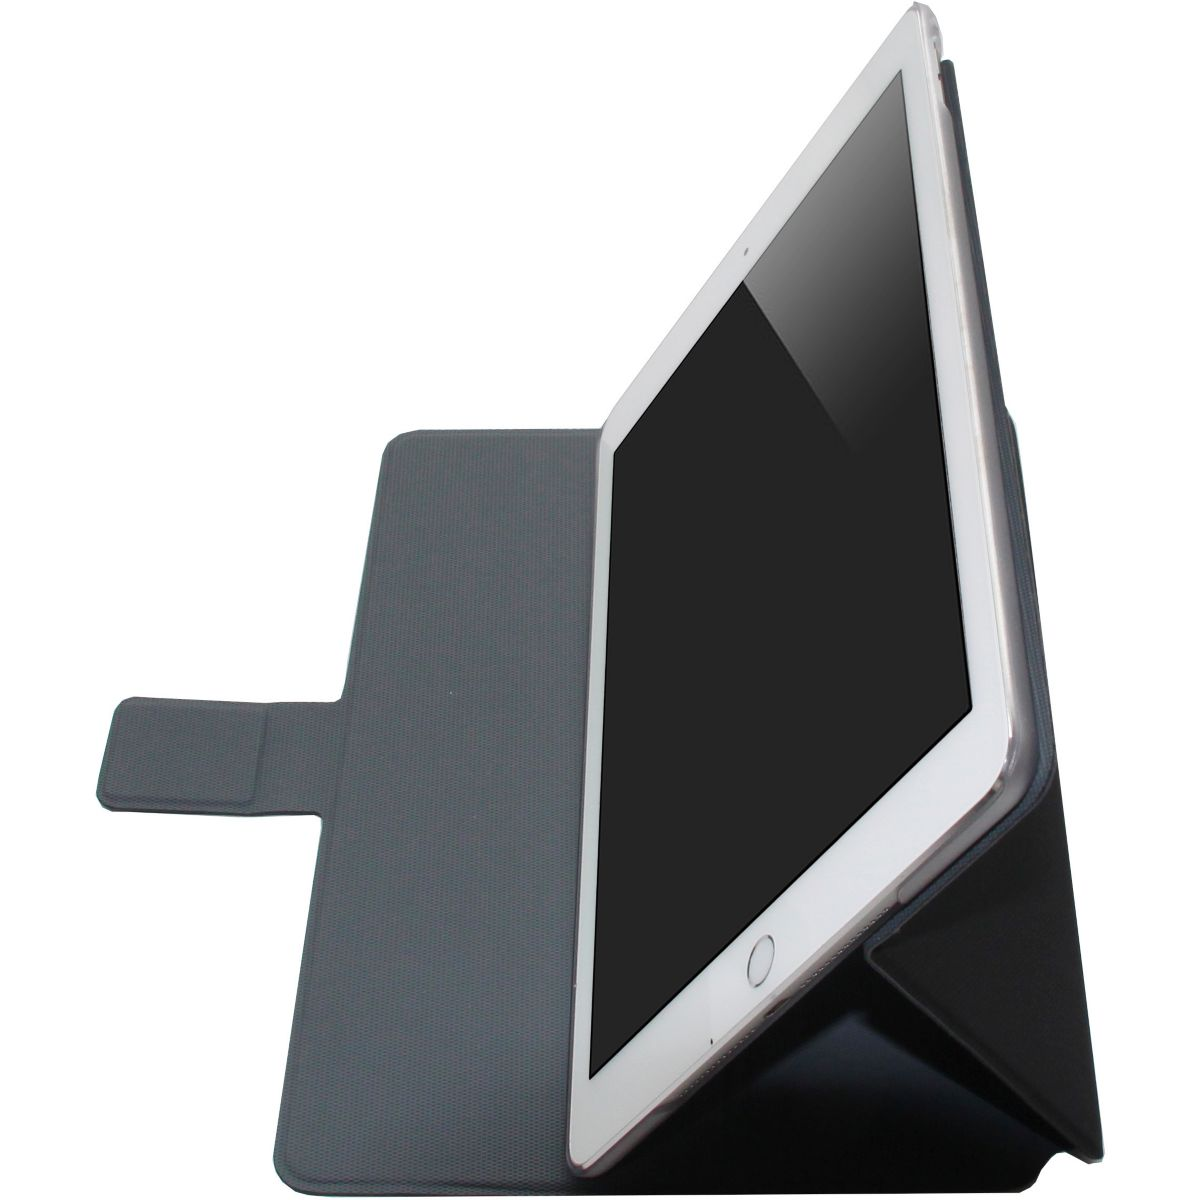 essentielb etui folio rotatif pour ipad air 2 comparer. Black Bedroom Furniture Sets. Home Design Ideas